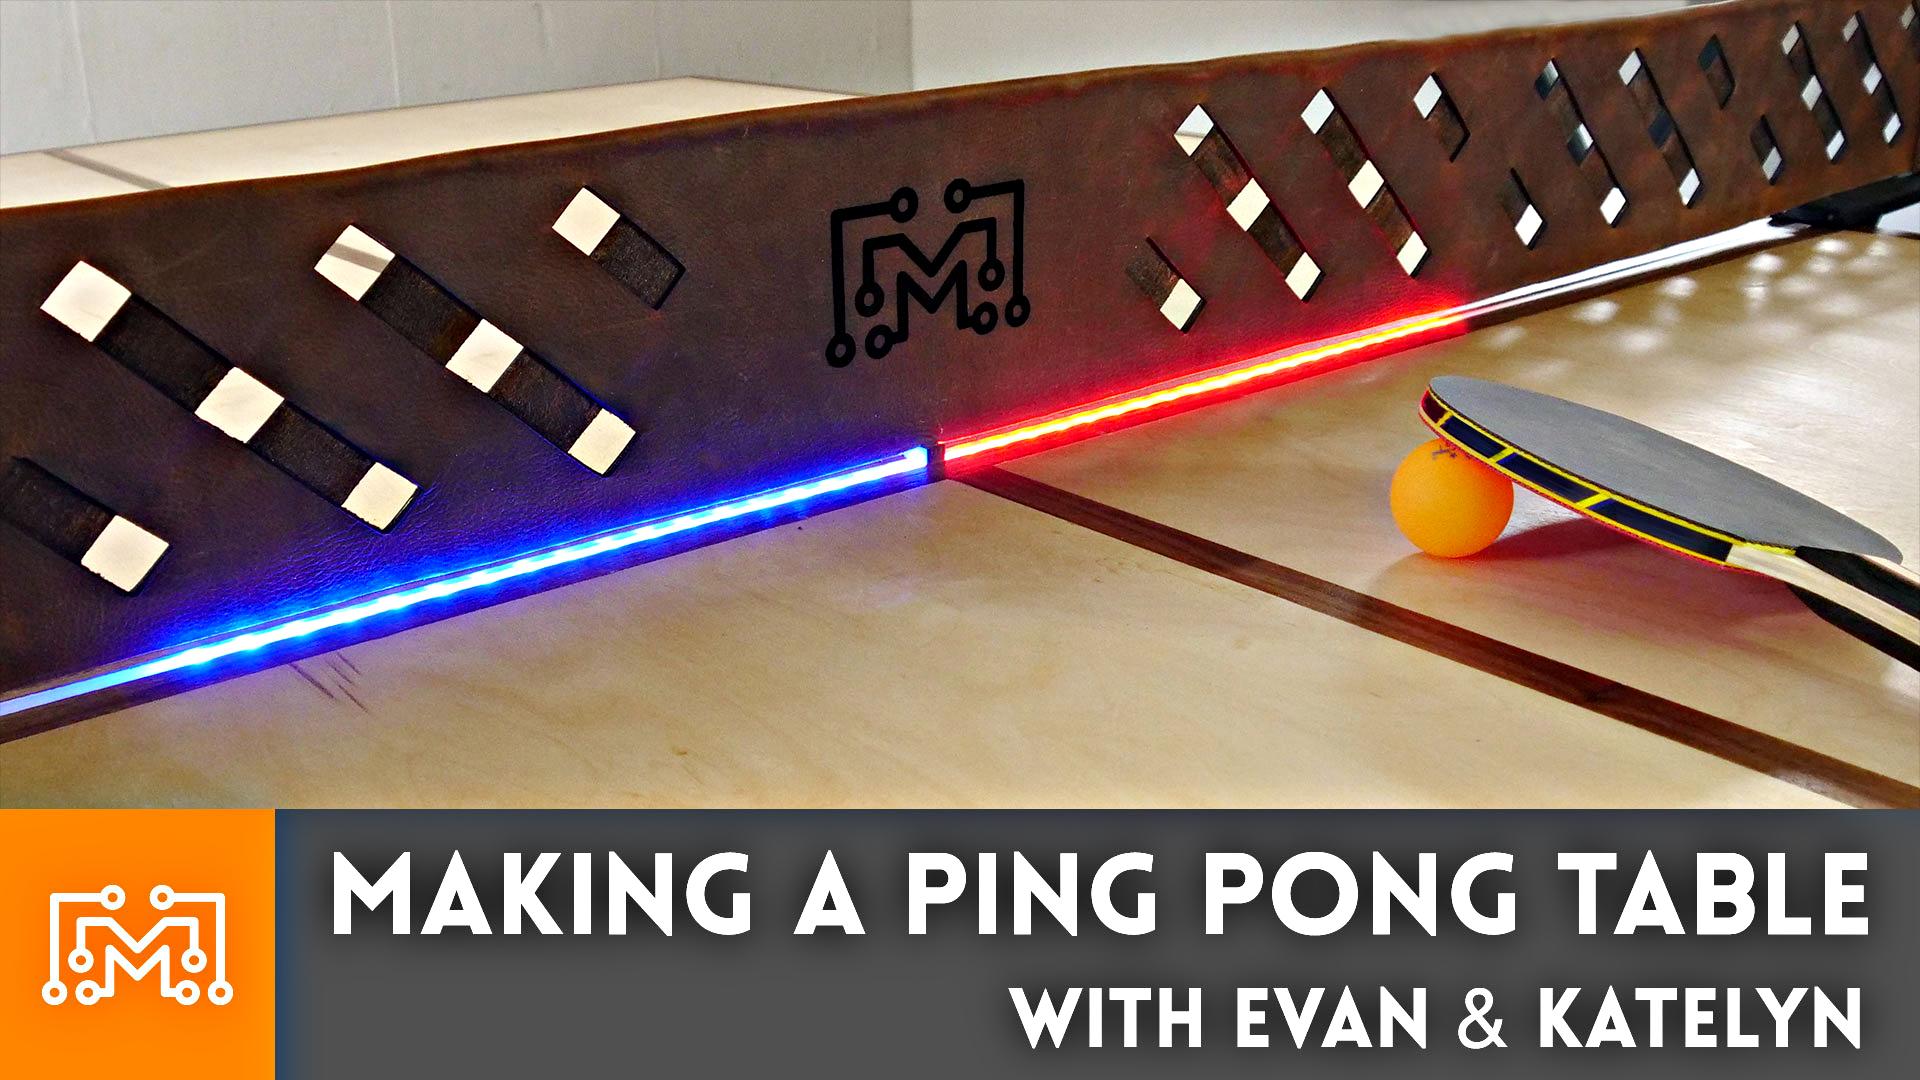 How To Make A Ping Pong Table I Like To Make Stuff